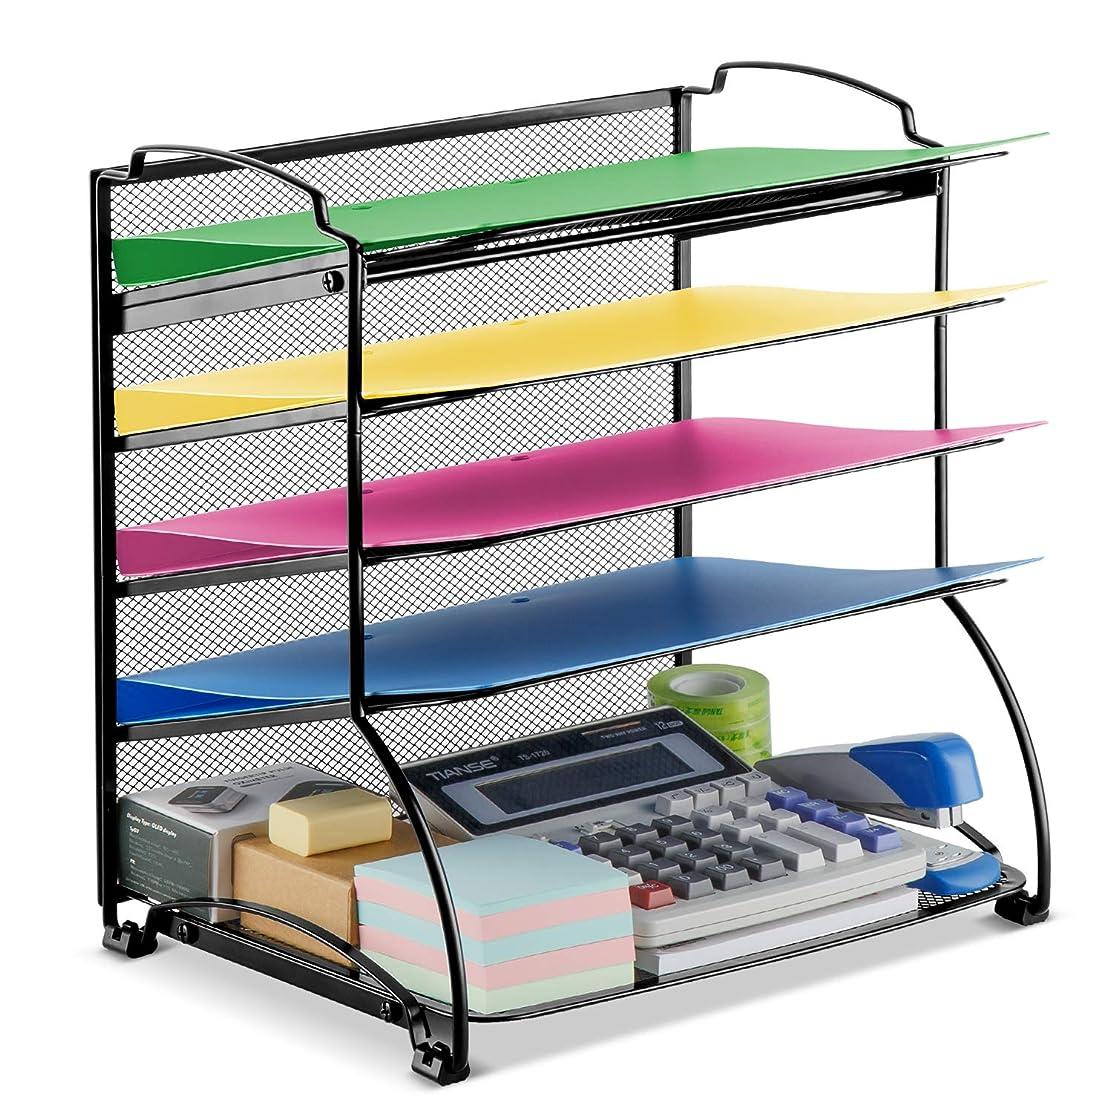 Bextsware 5-Tier Mesh Desktop Organizer File Folder Document Letter Tray Holder Desk Accessories Organization Supplies for Office or Home, Black